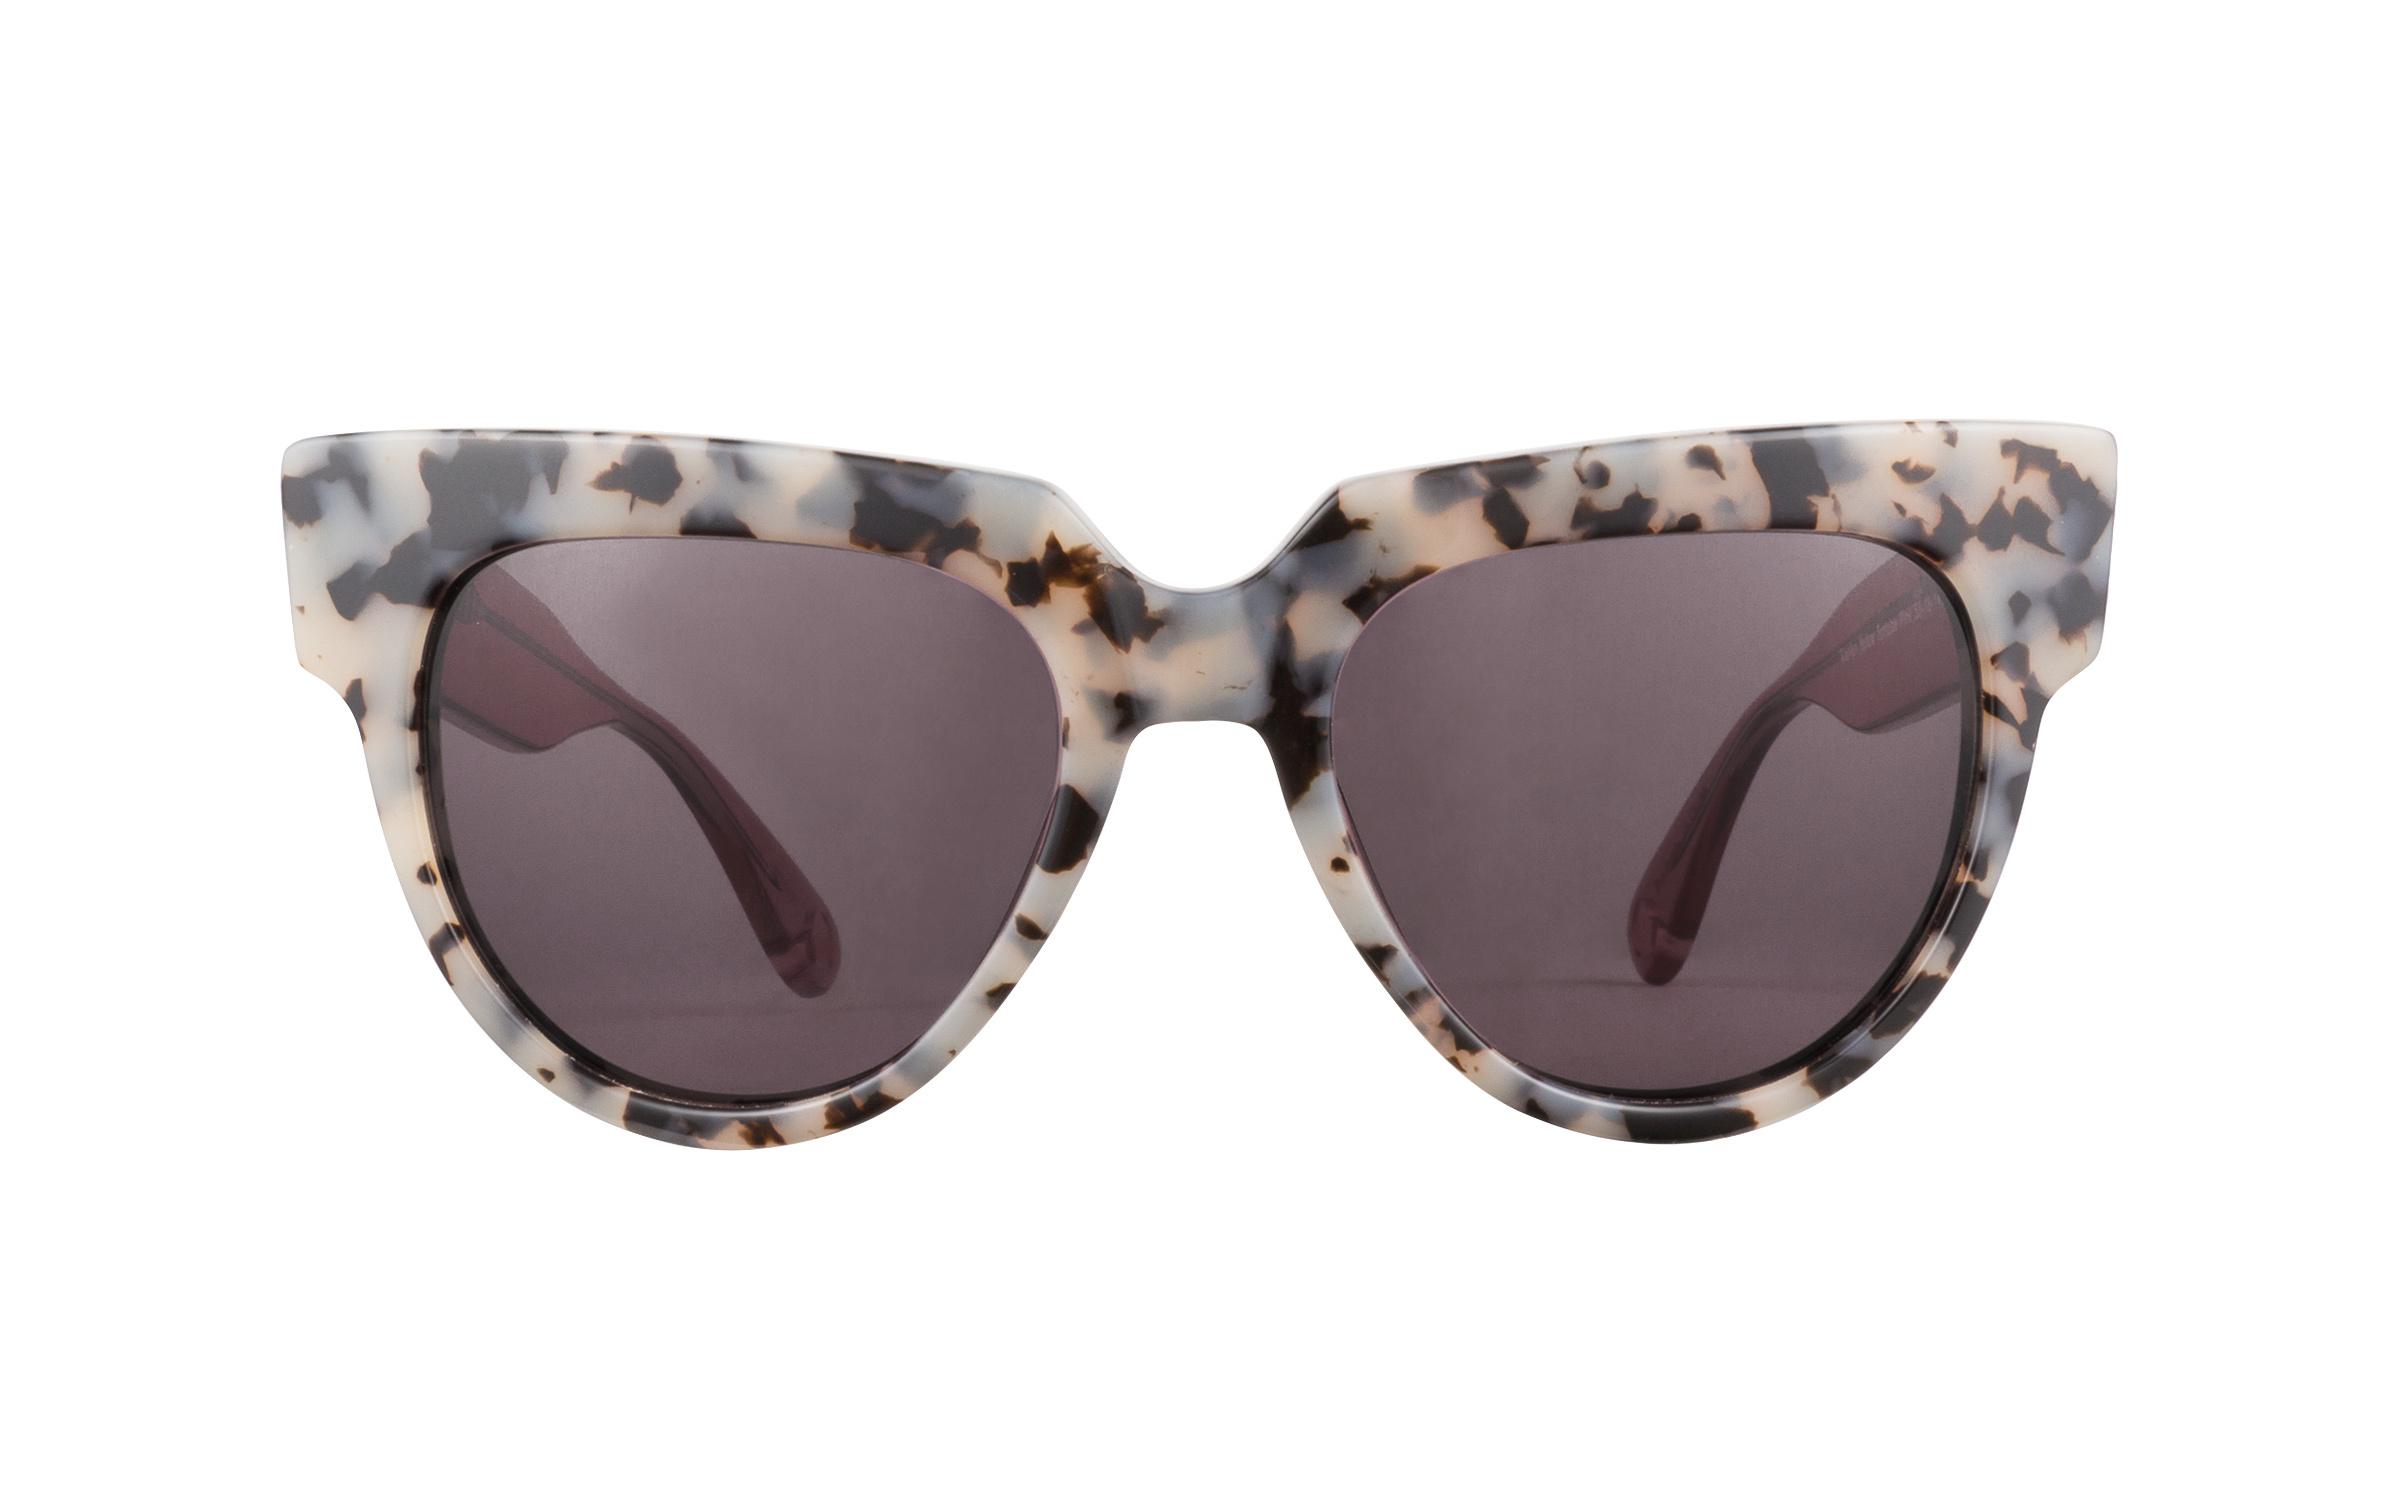 Love Marilyn Sunglasses in Tortoise/White/Pink | Plastic - Online Coastal